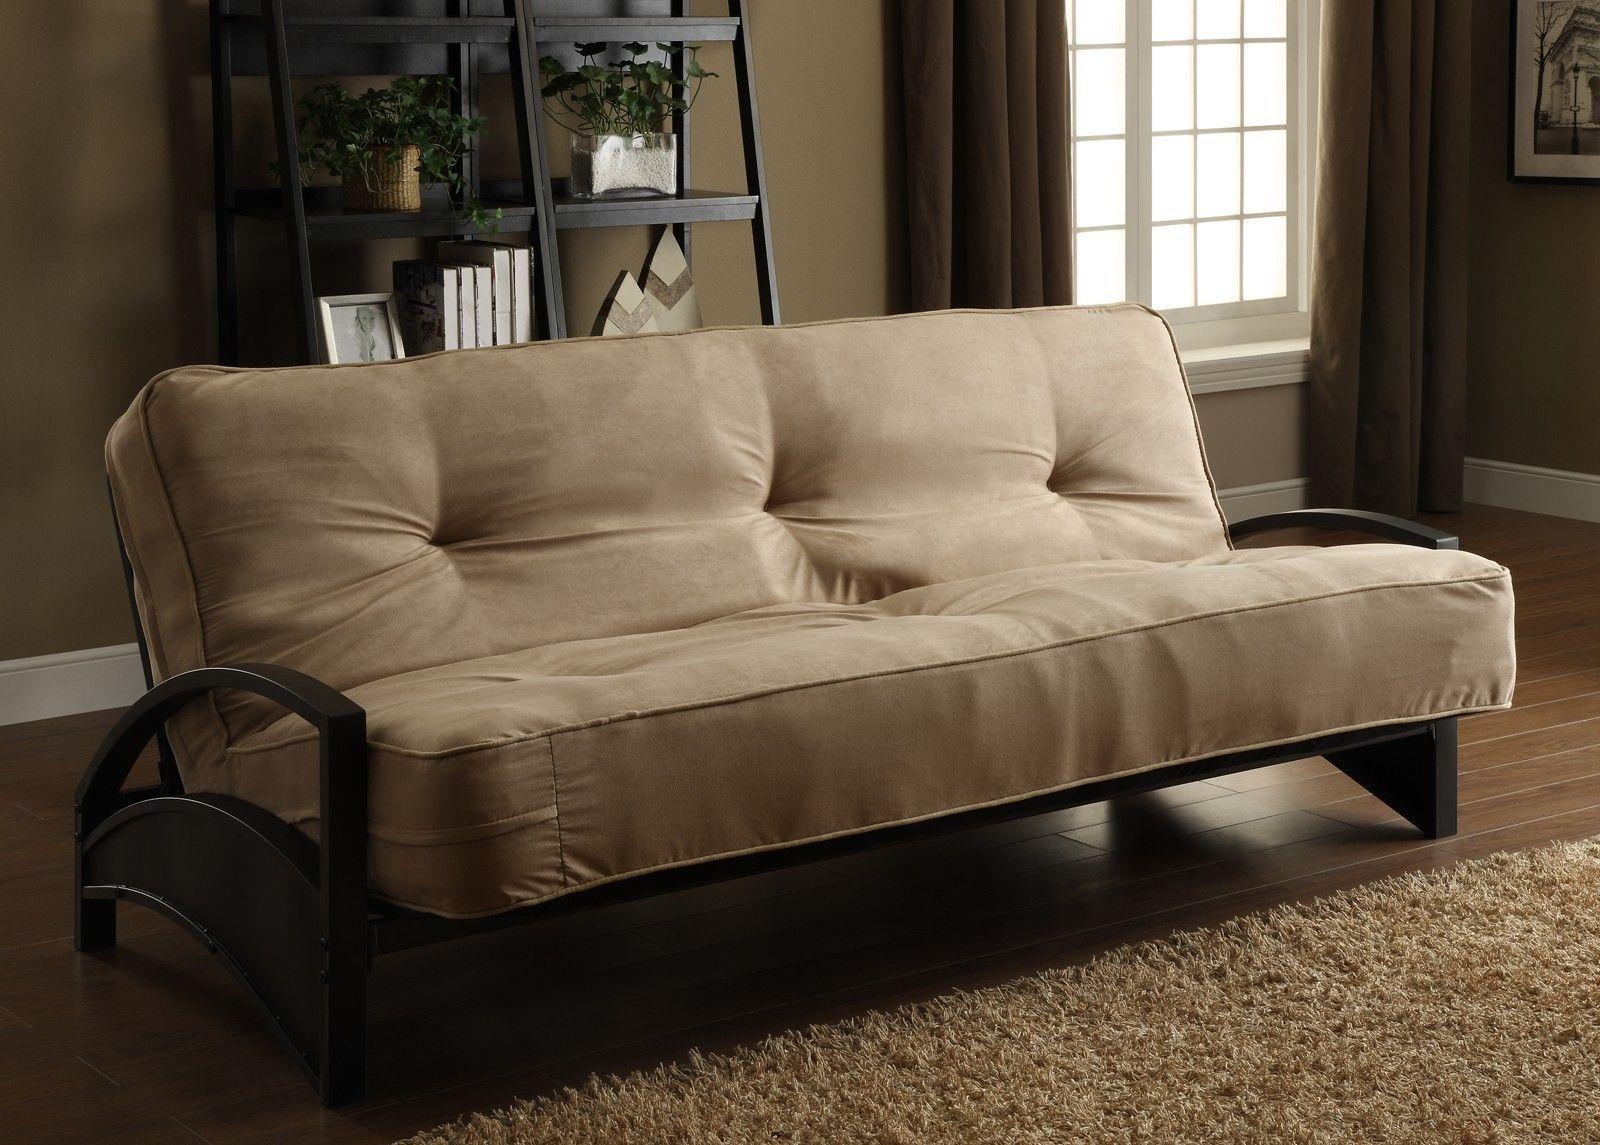 mylner futon frame devine designs pinterest futon frame and woods